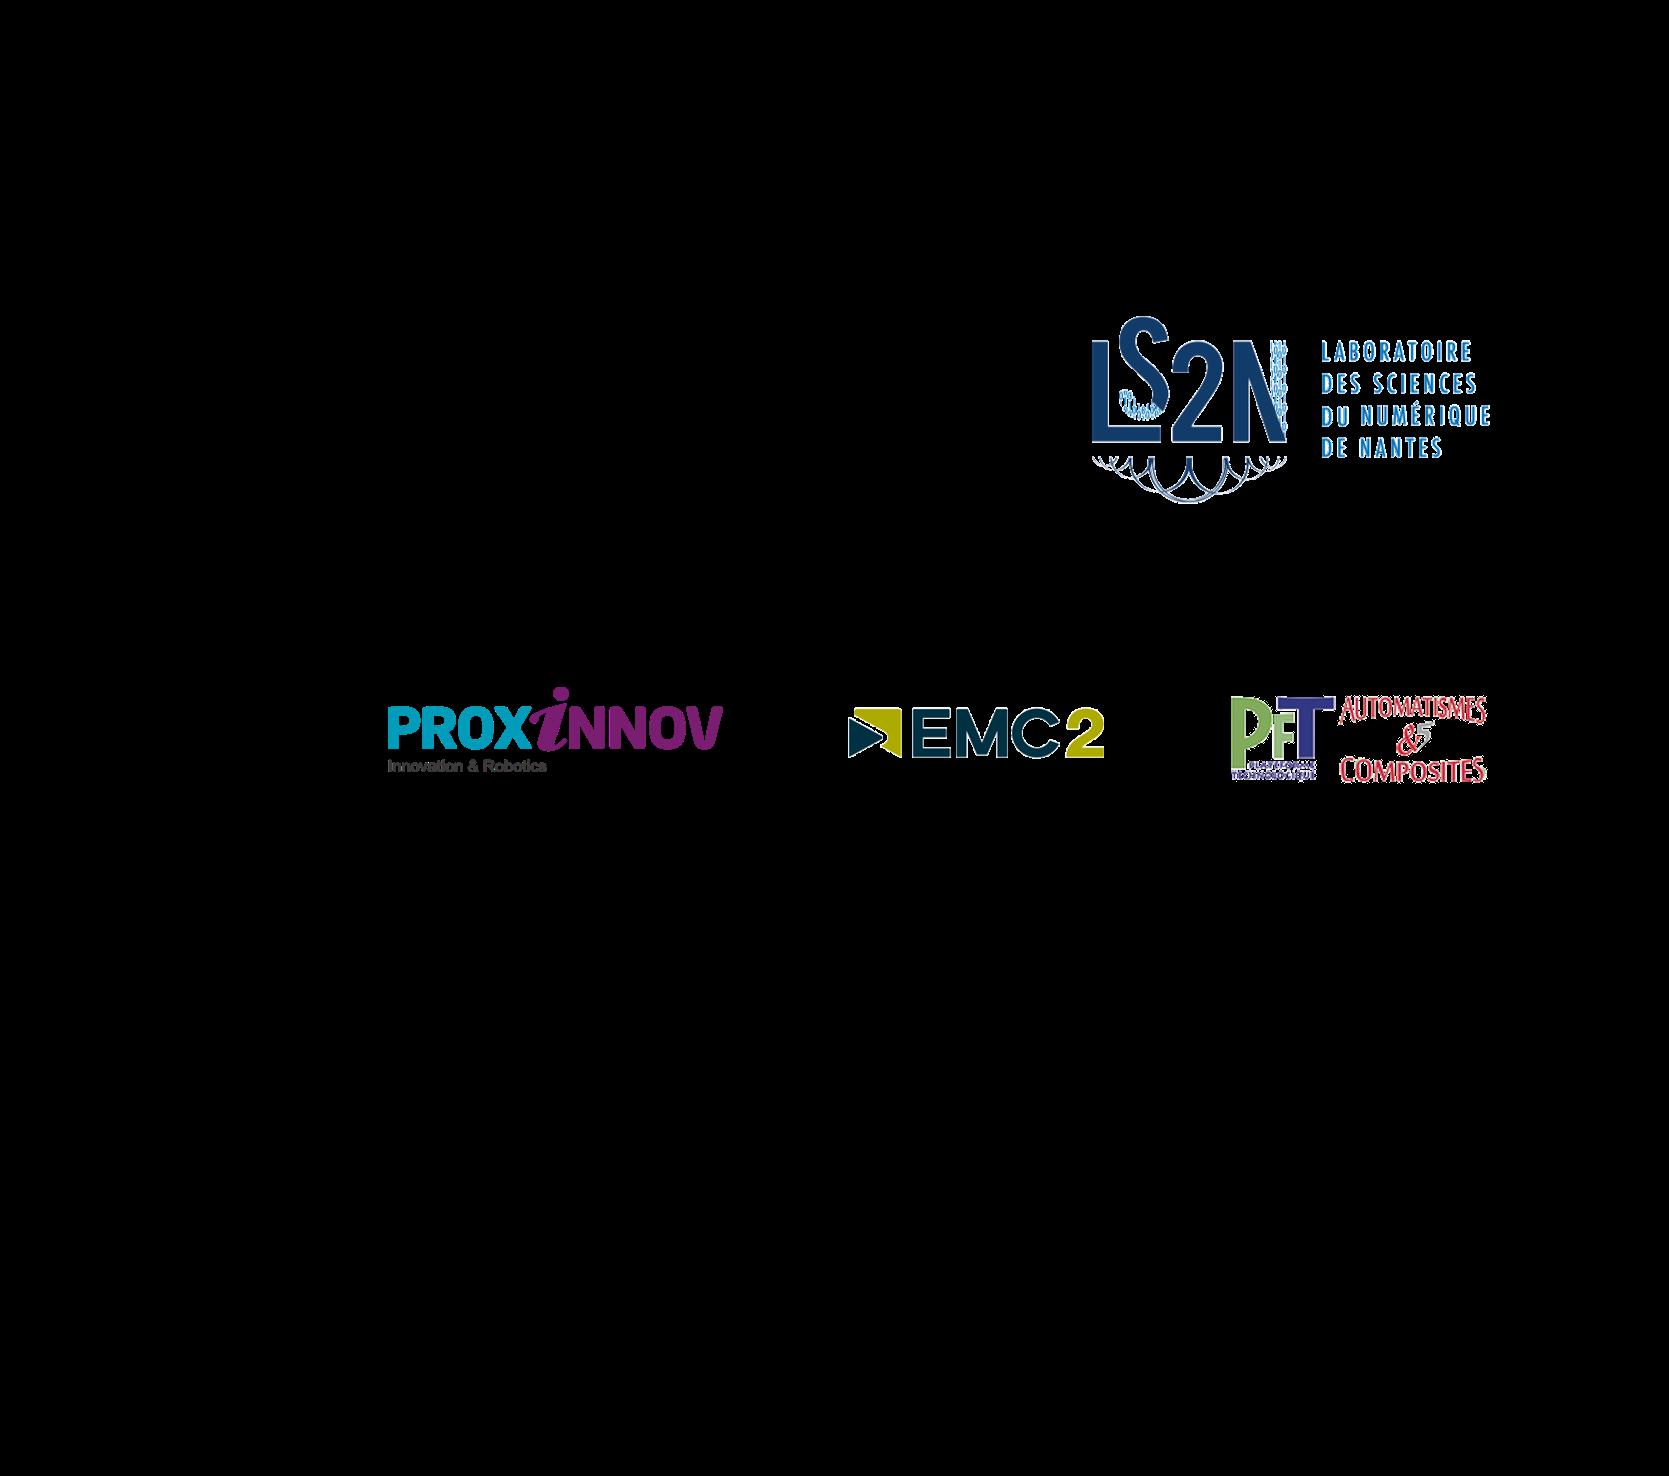 Logos_labos-partenaires_AUTOMATISME ROBOTIQUE